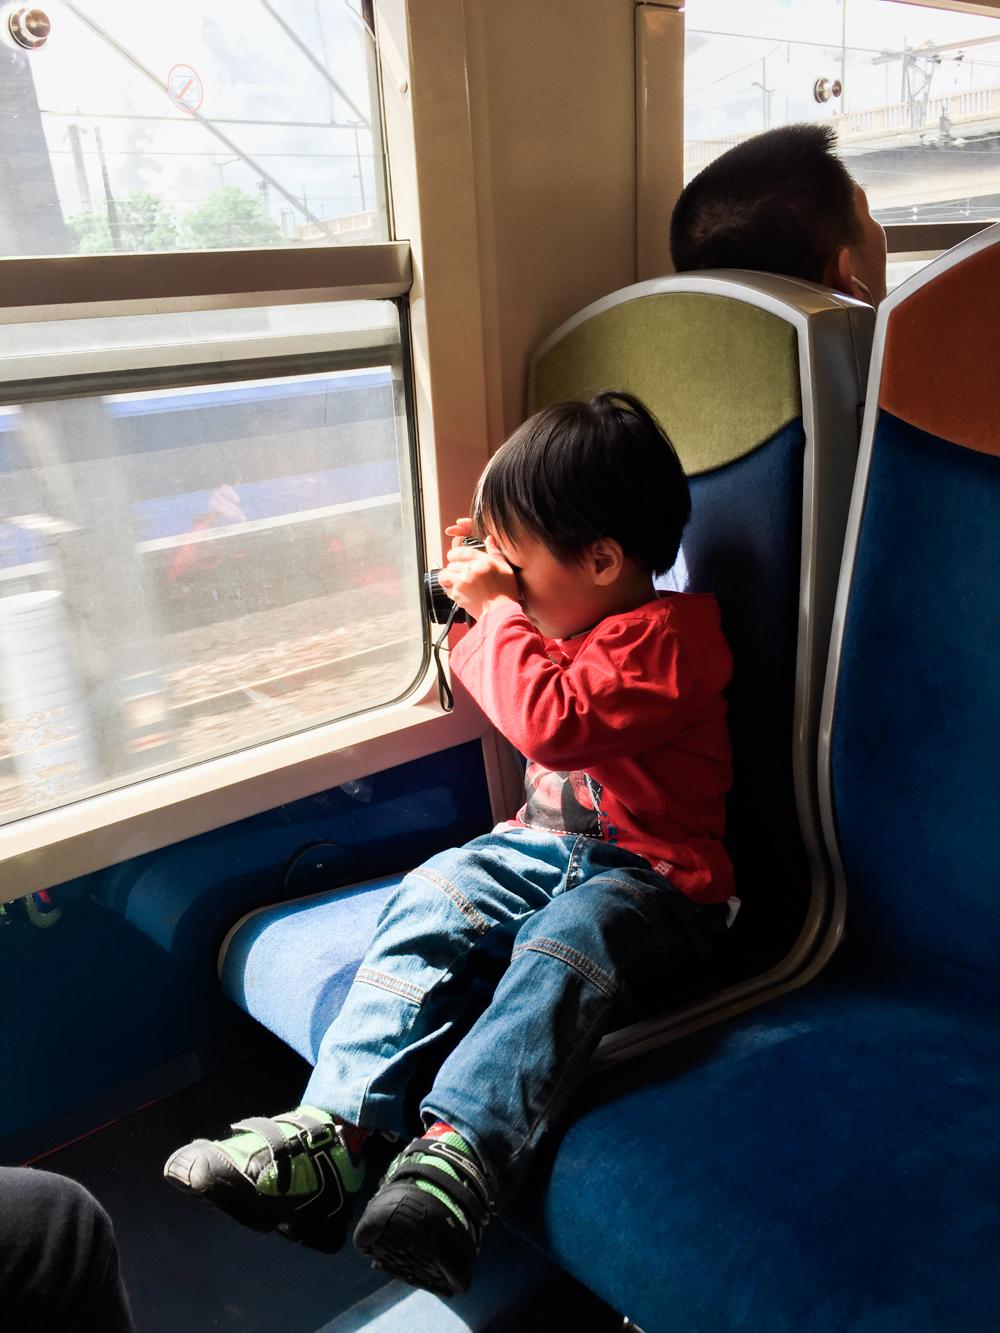 Leo creating magic on the train